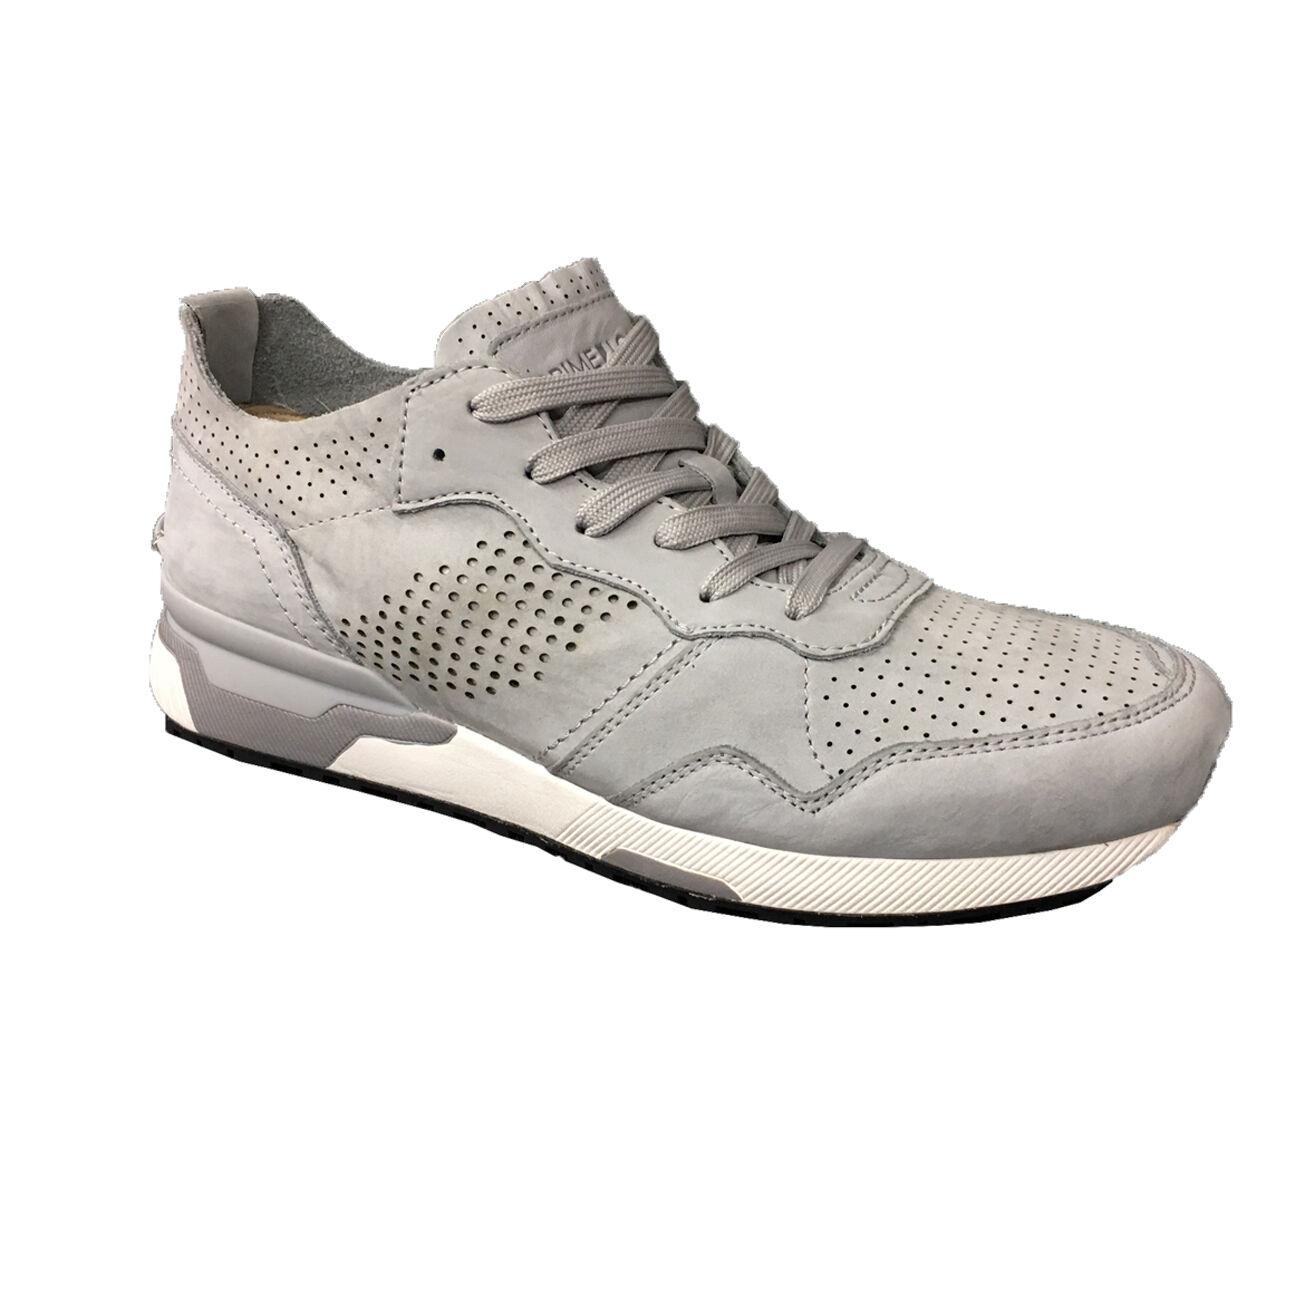 Crime London Men's shoes Grey Unlined Mod. 11522s17b 100% Suede Leather